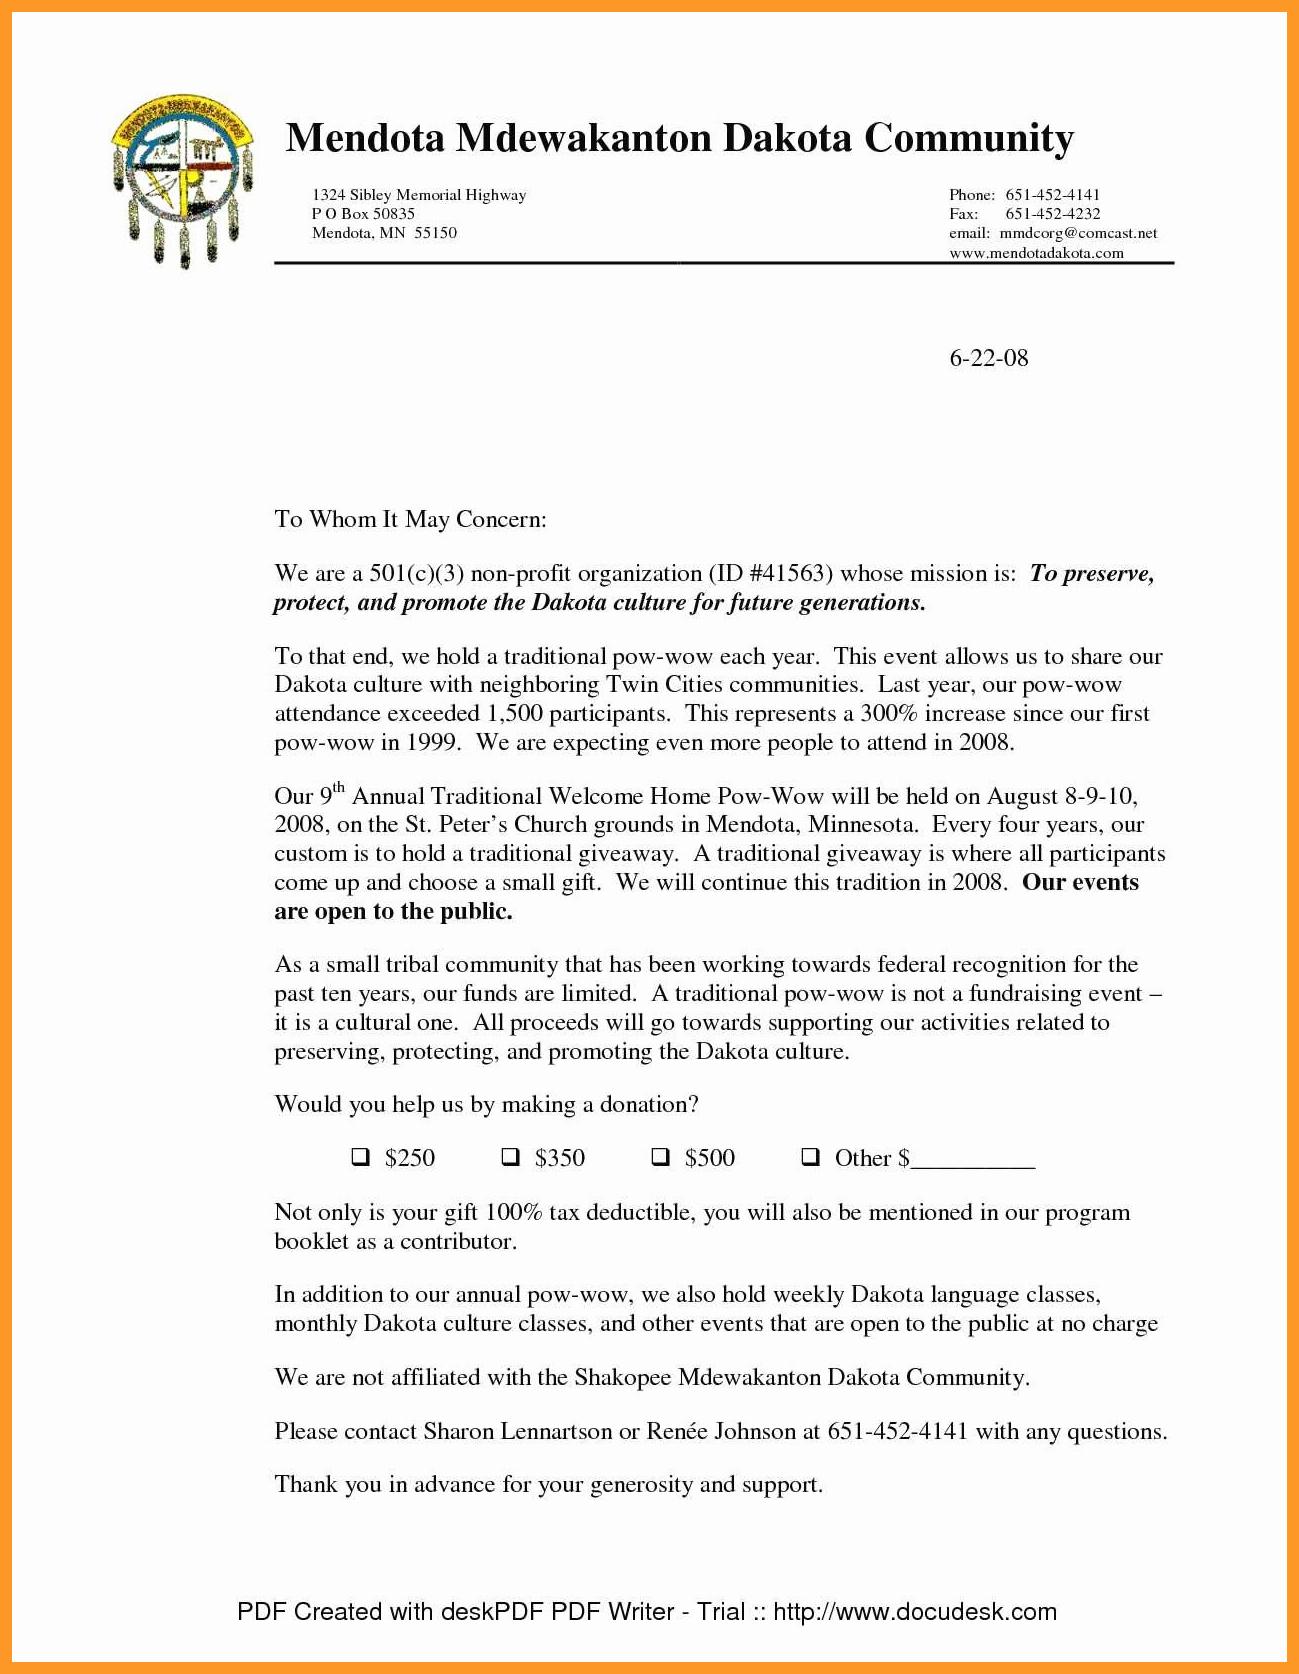 Charitable Donation form Template Fresh 12 13 Charitable Contribution Letter Sample